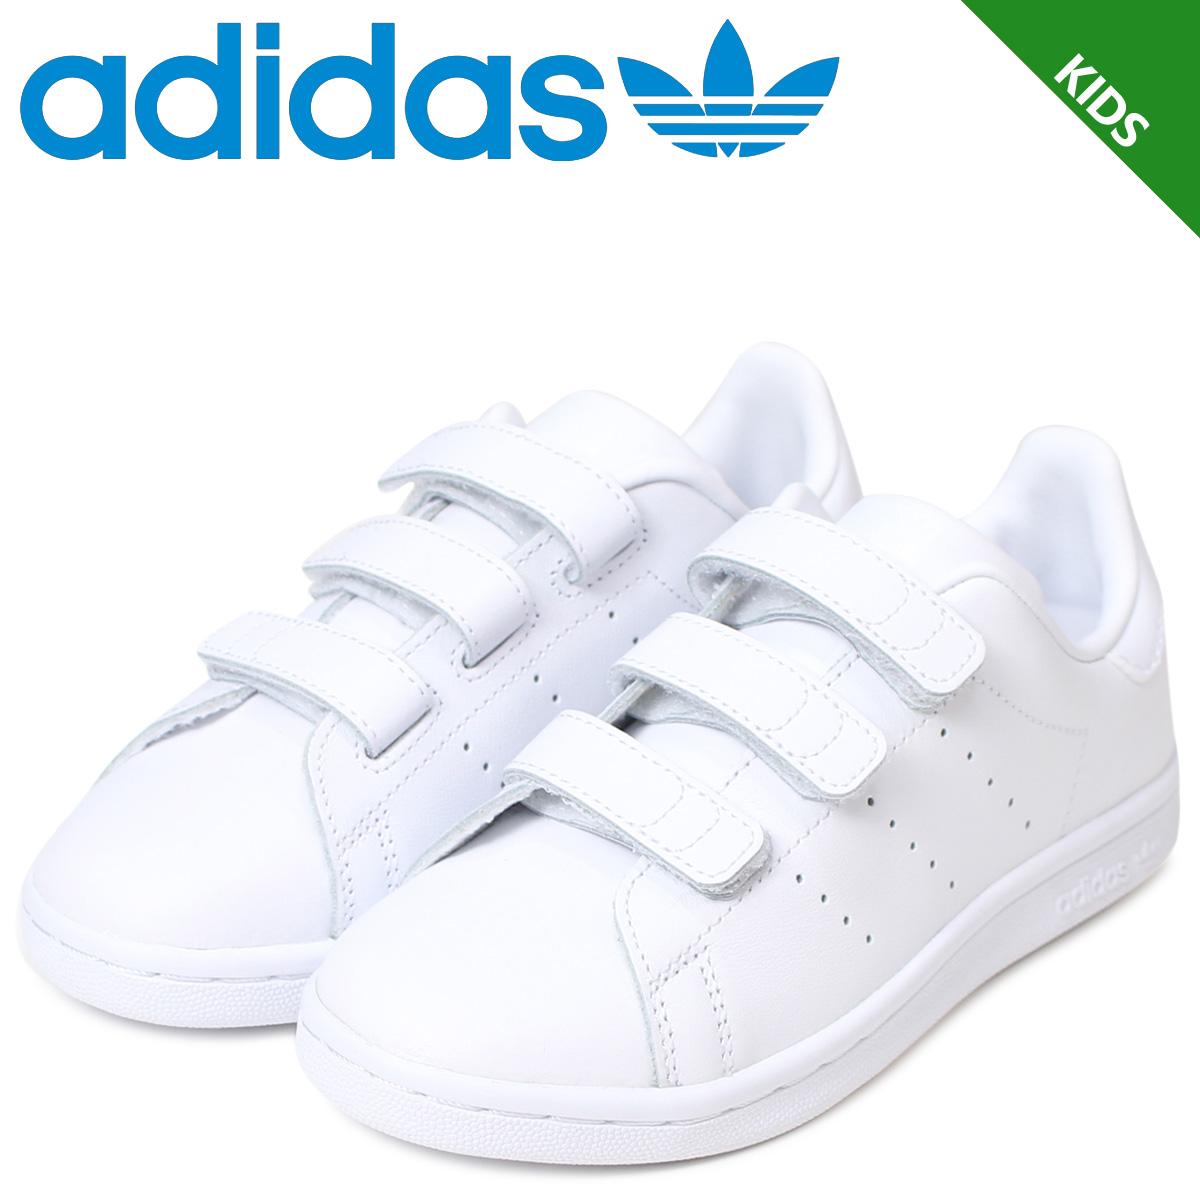 adidas Originals Stan Smith kids sneakers Adidas originals STAN SMITH CF C  BB2997 shoes white [172]